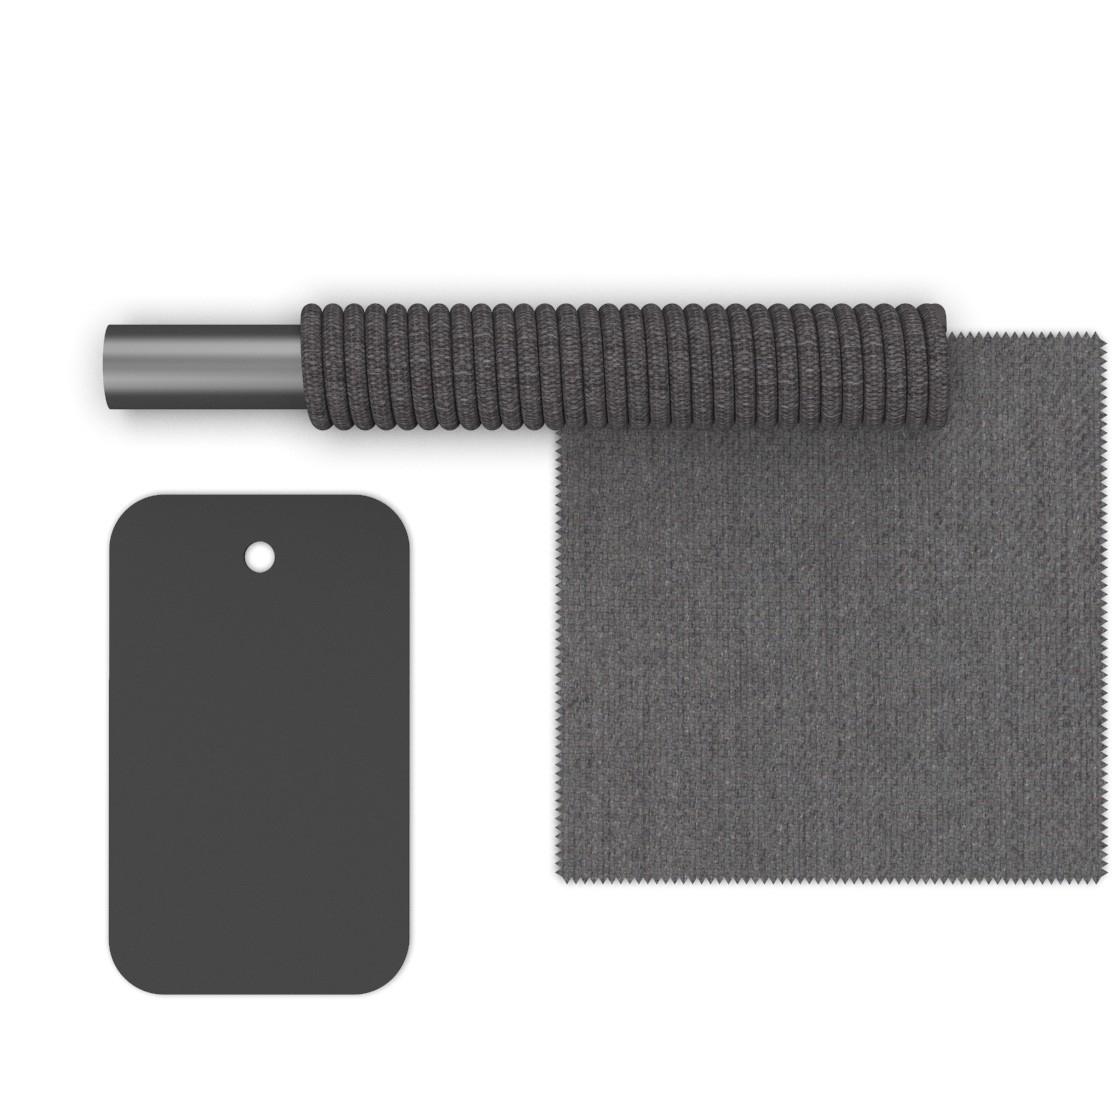 Sofy_Charcoal-dark grey